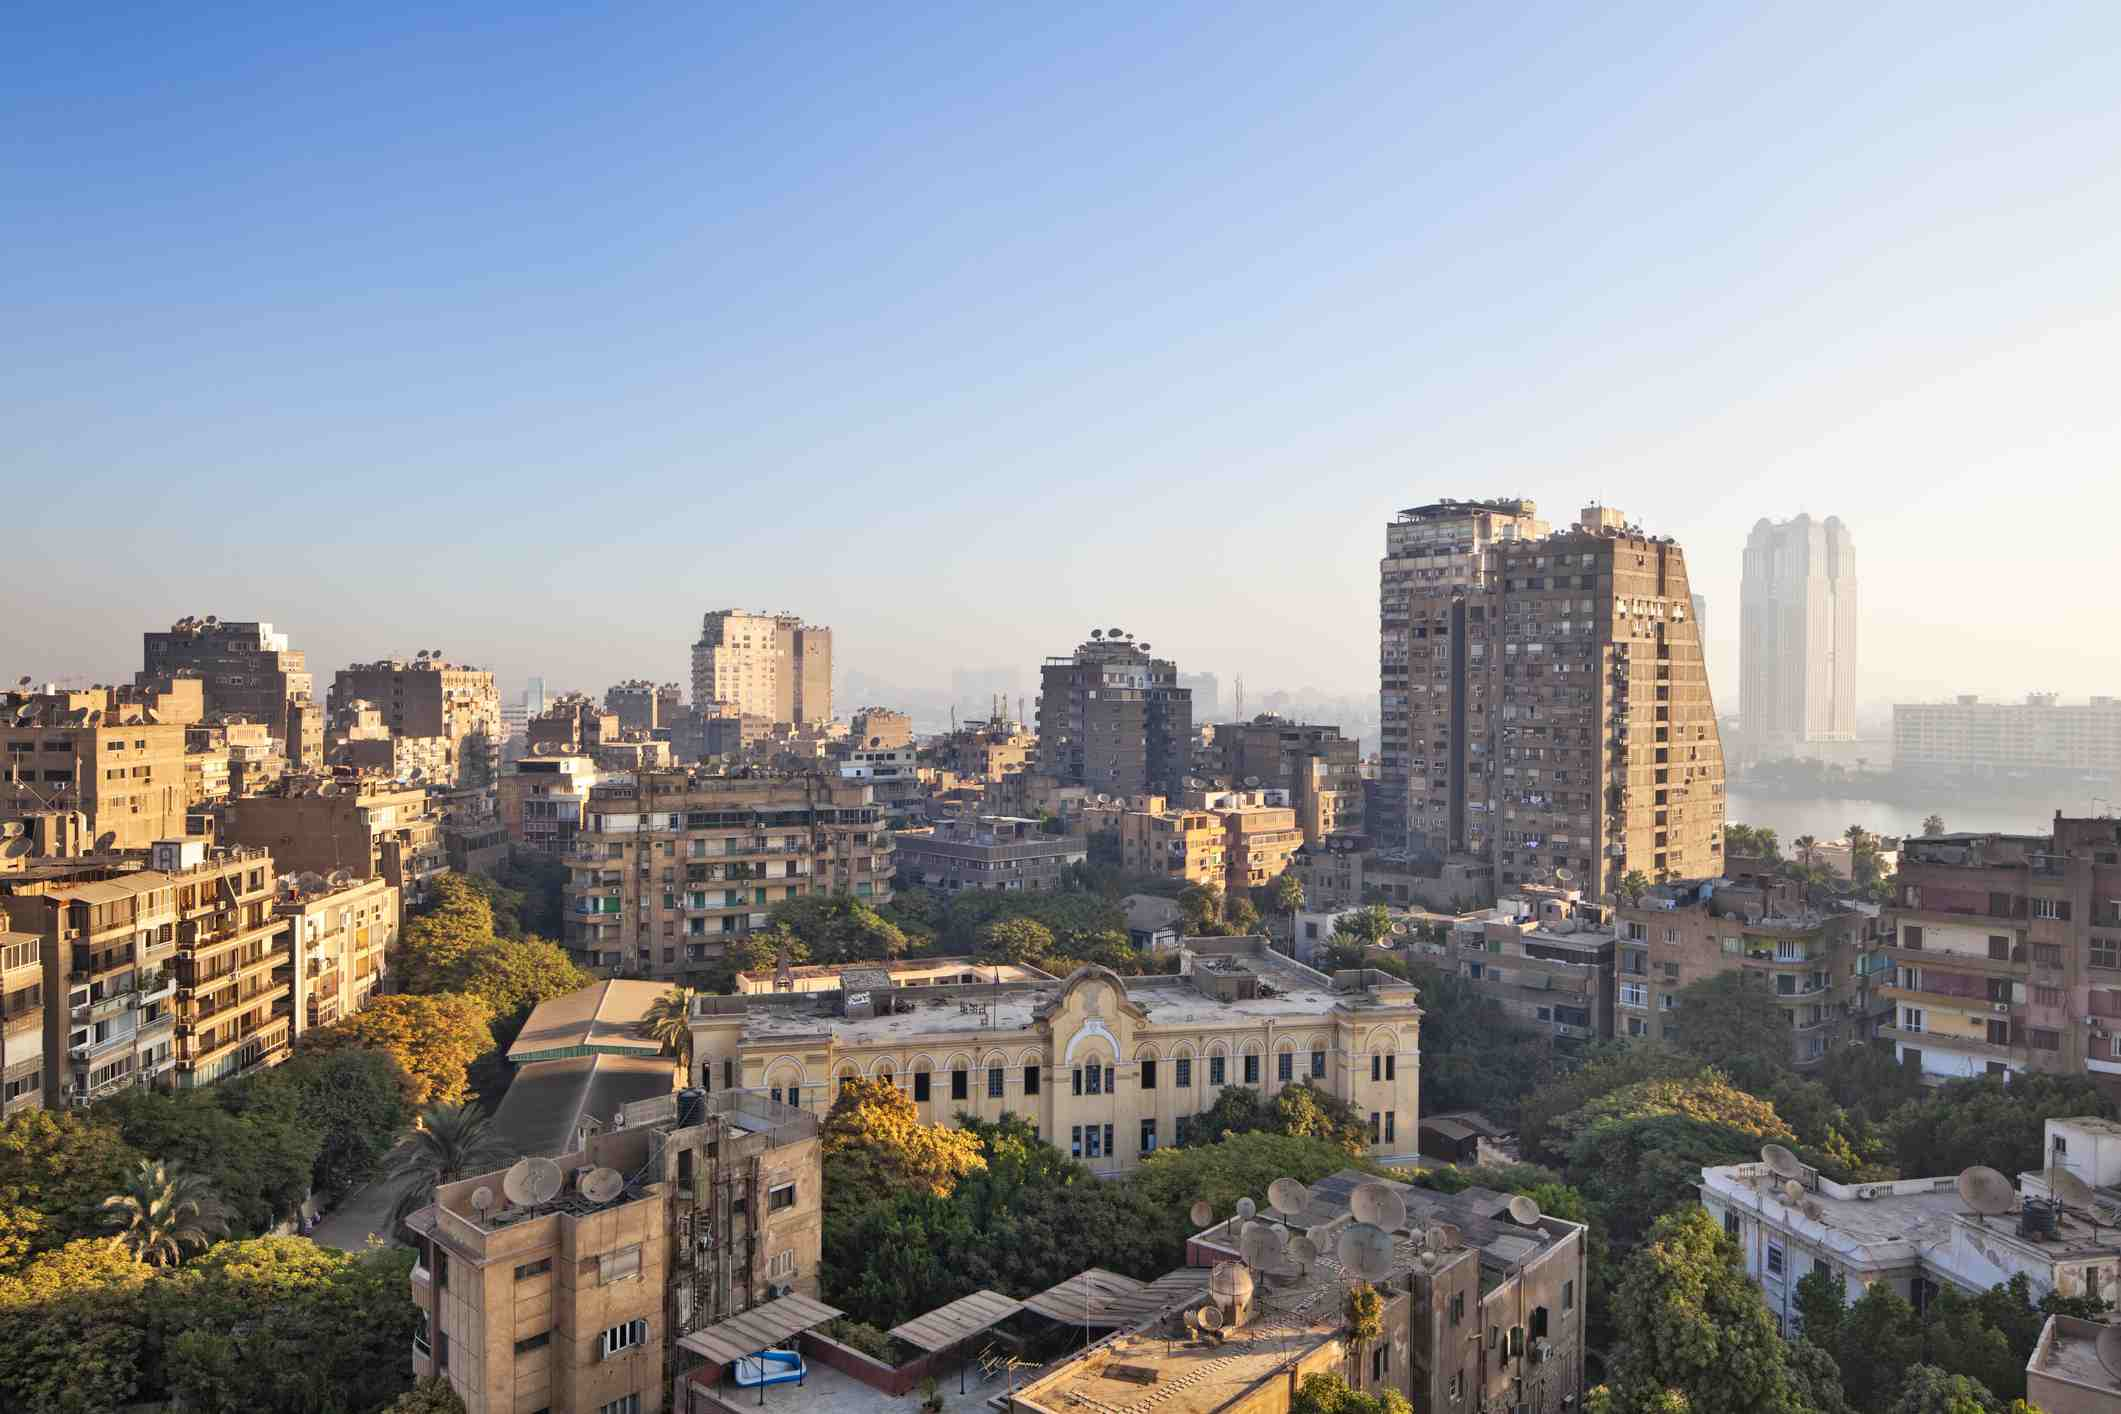 Zamalek district in Cairo, Egypt